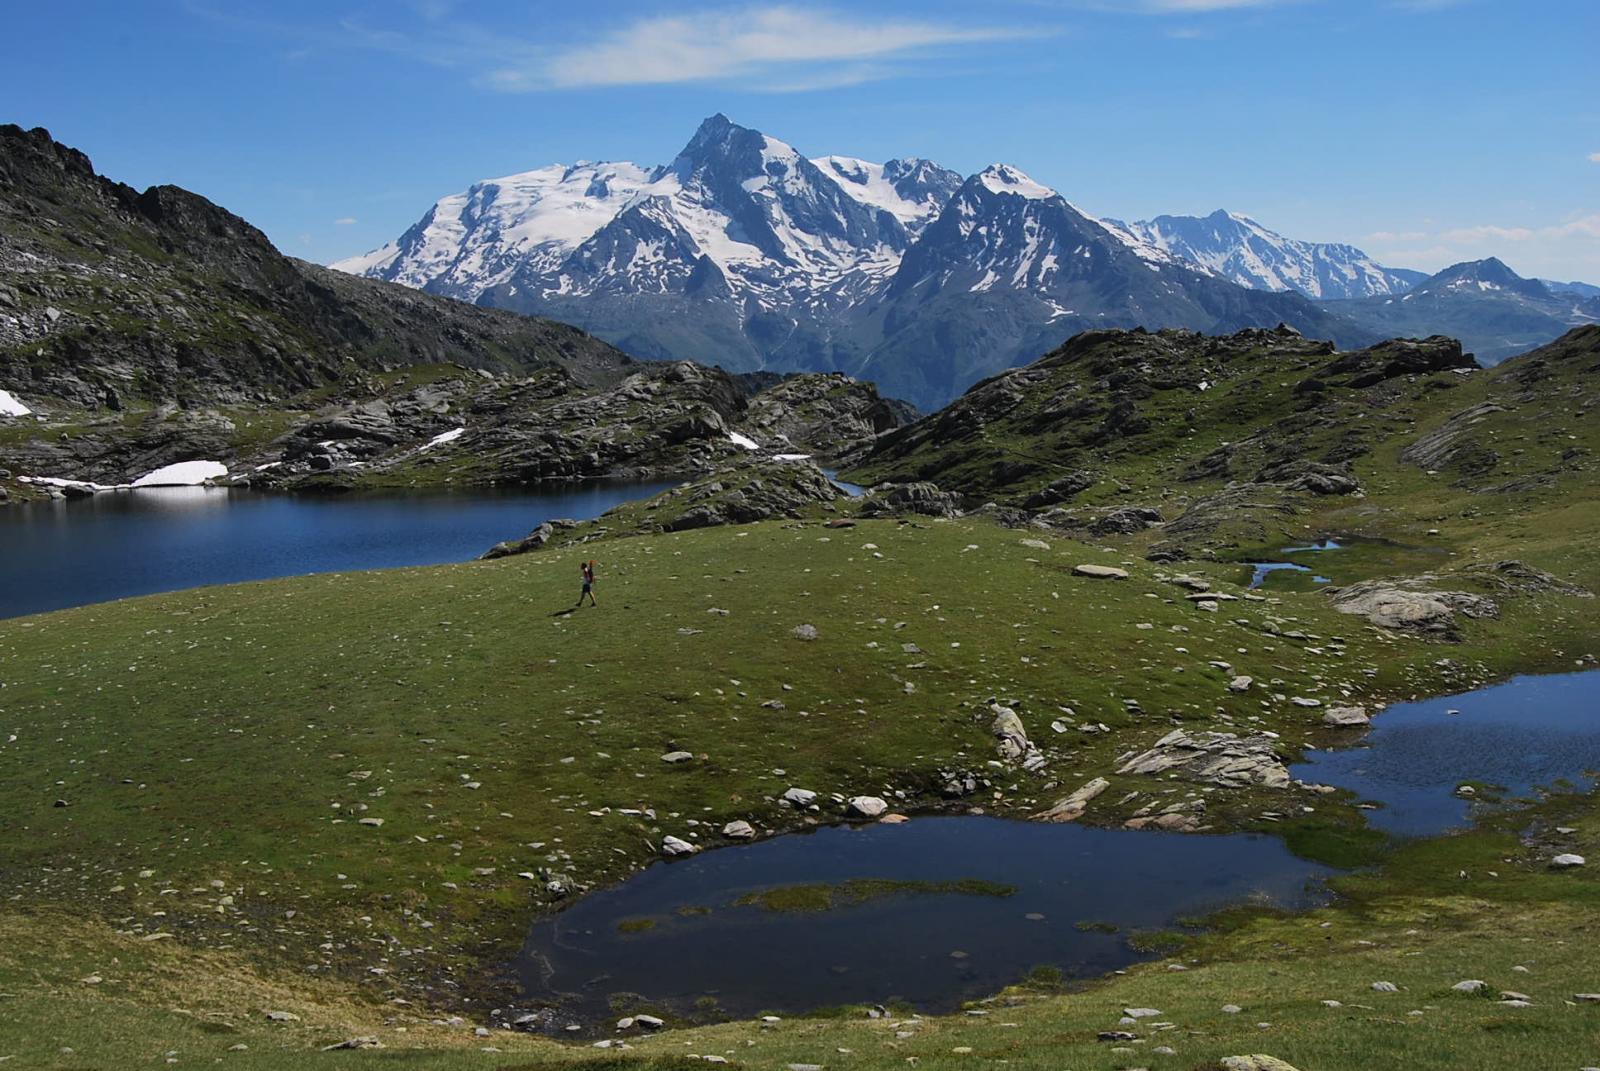 I laghi ed il Mt Pourri